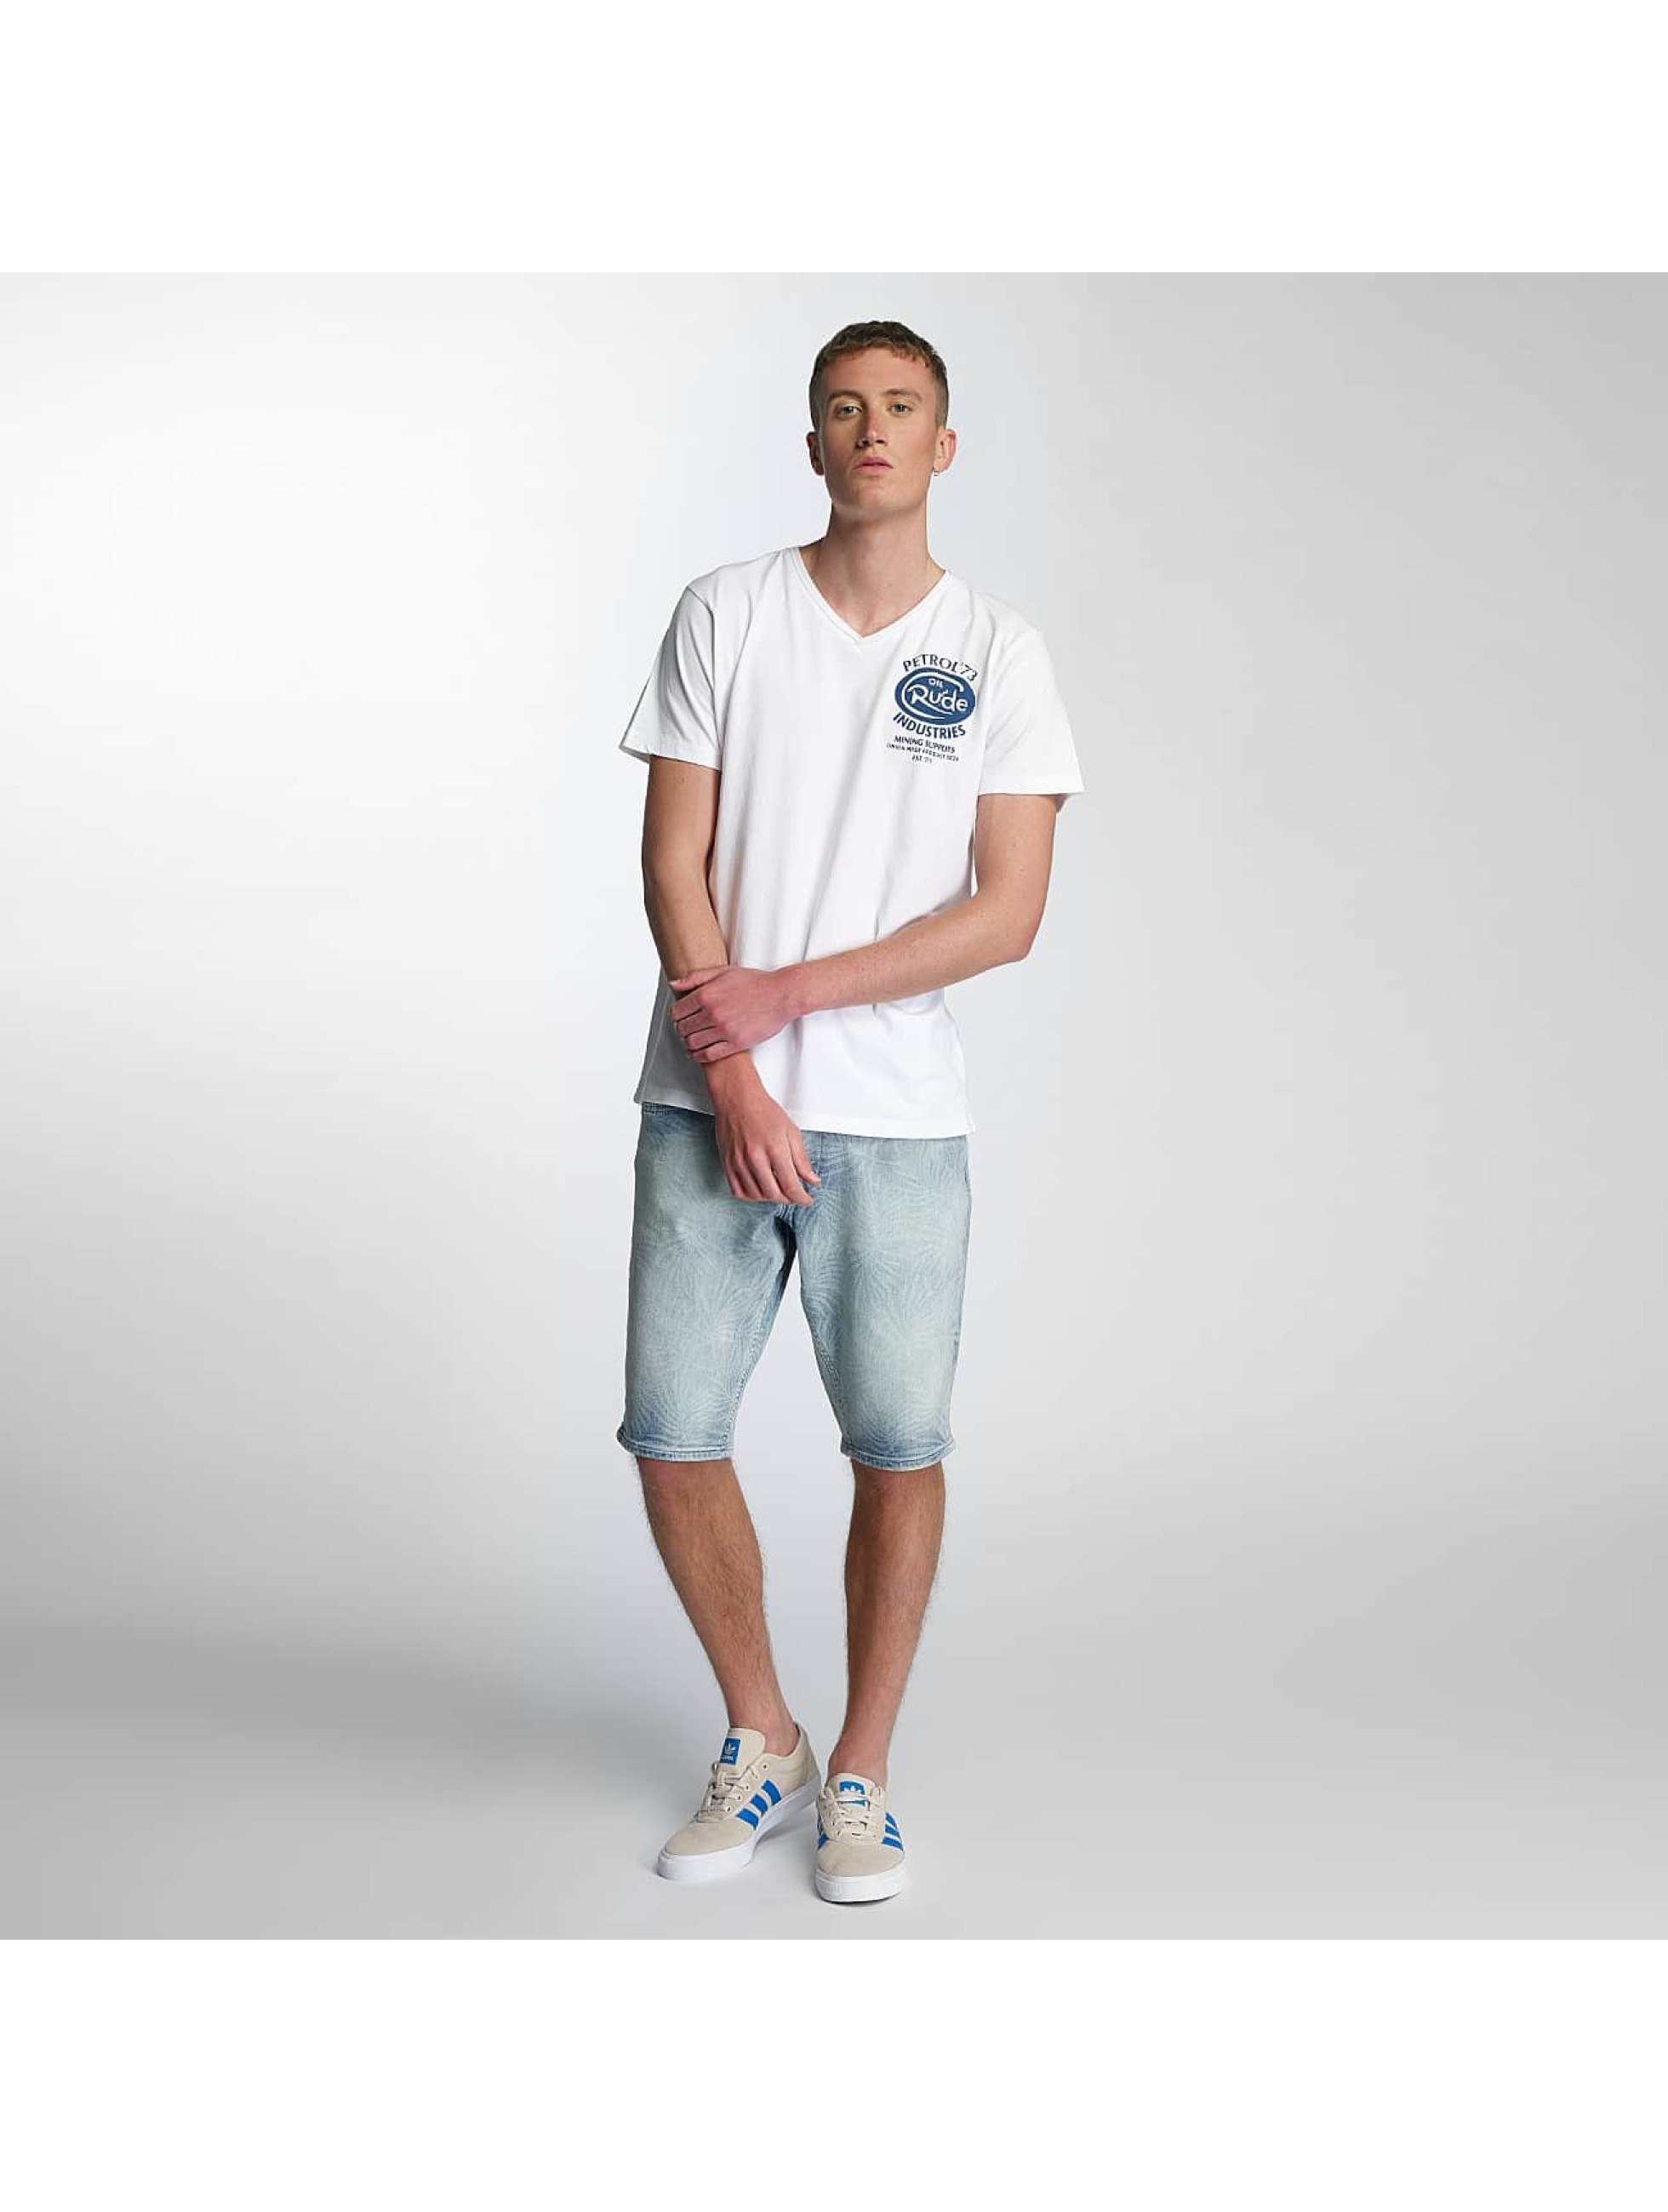 Petrol-Industries-Uomini-Maglieria-T-shirt-Rude